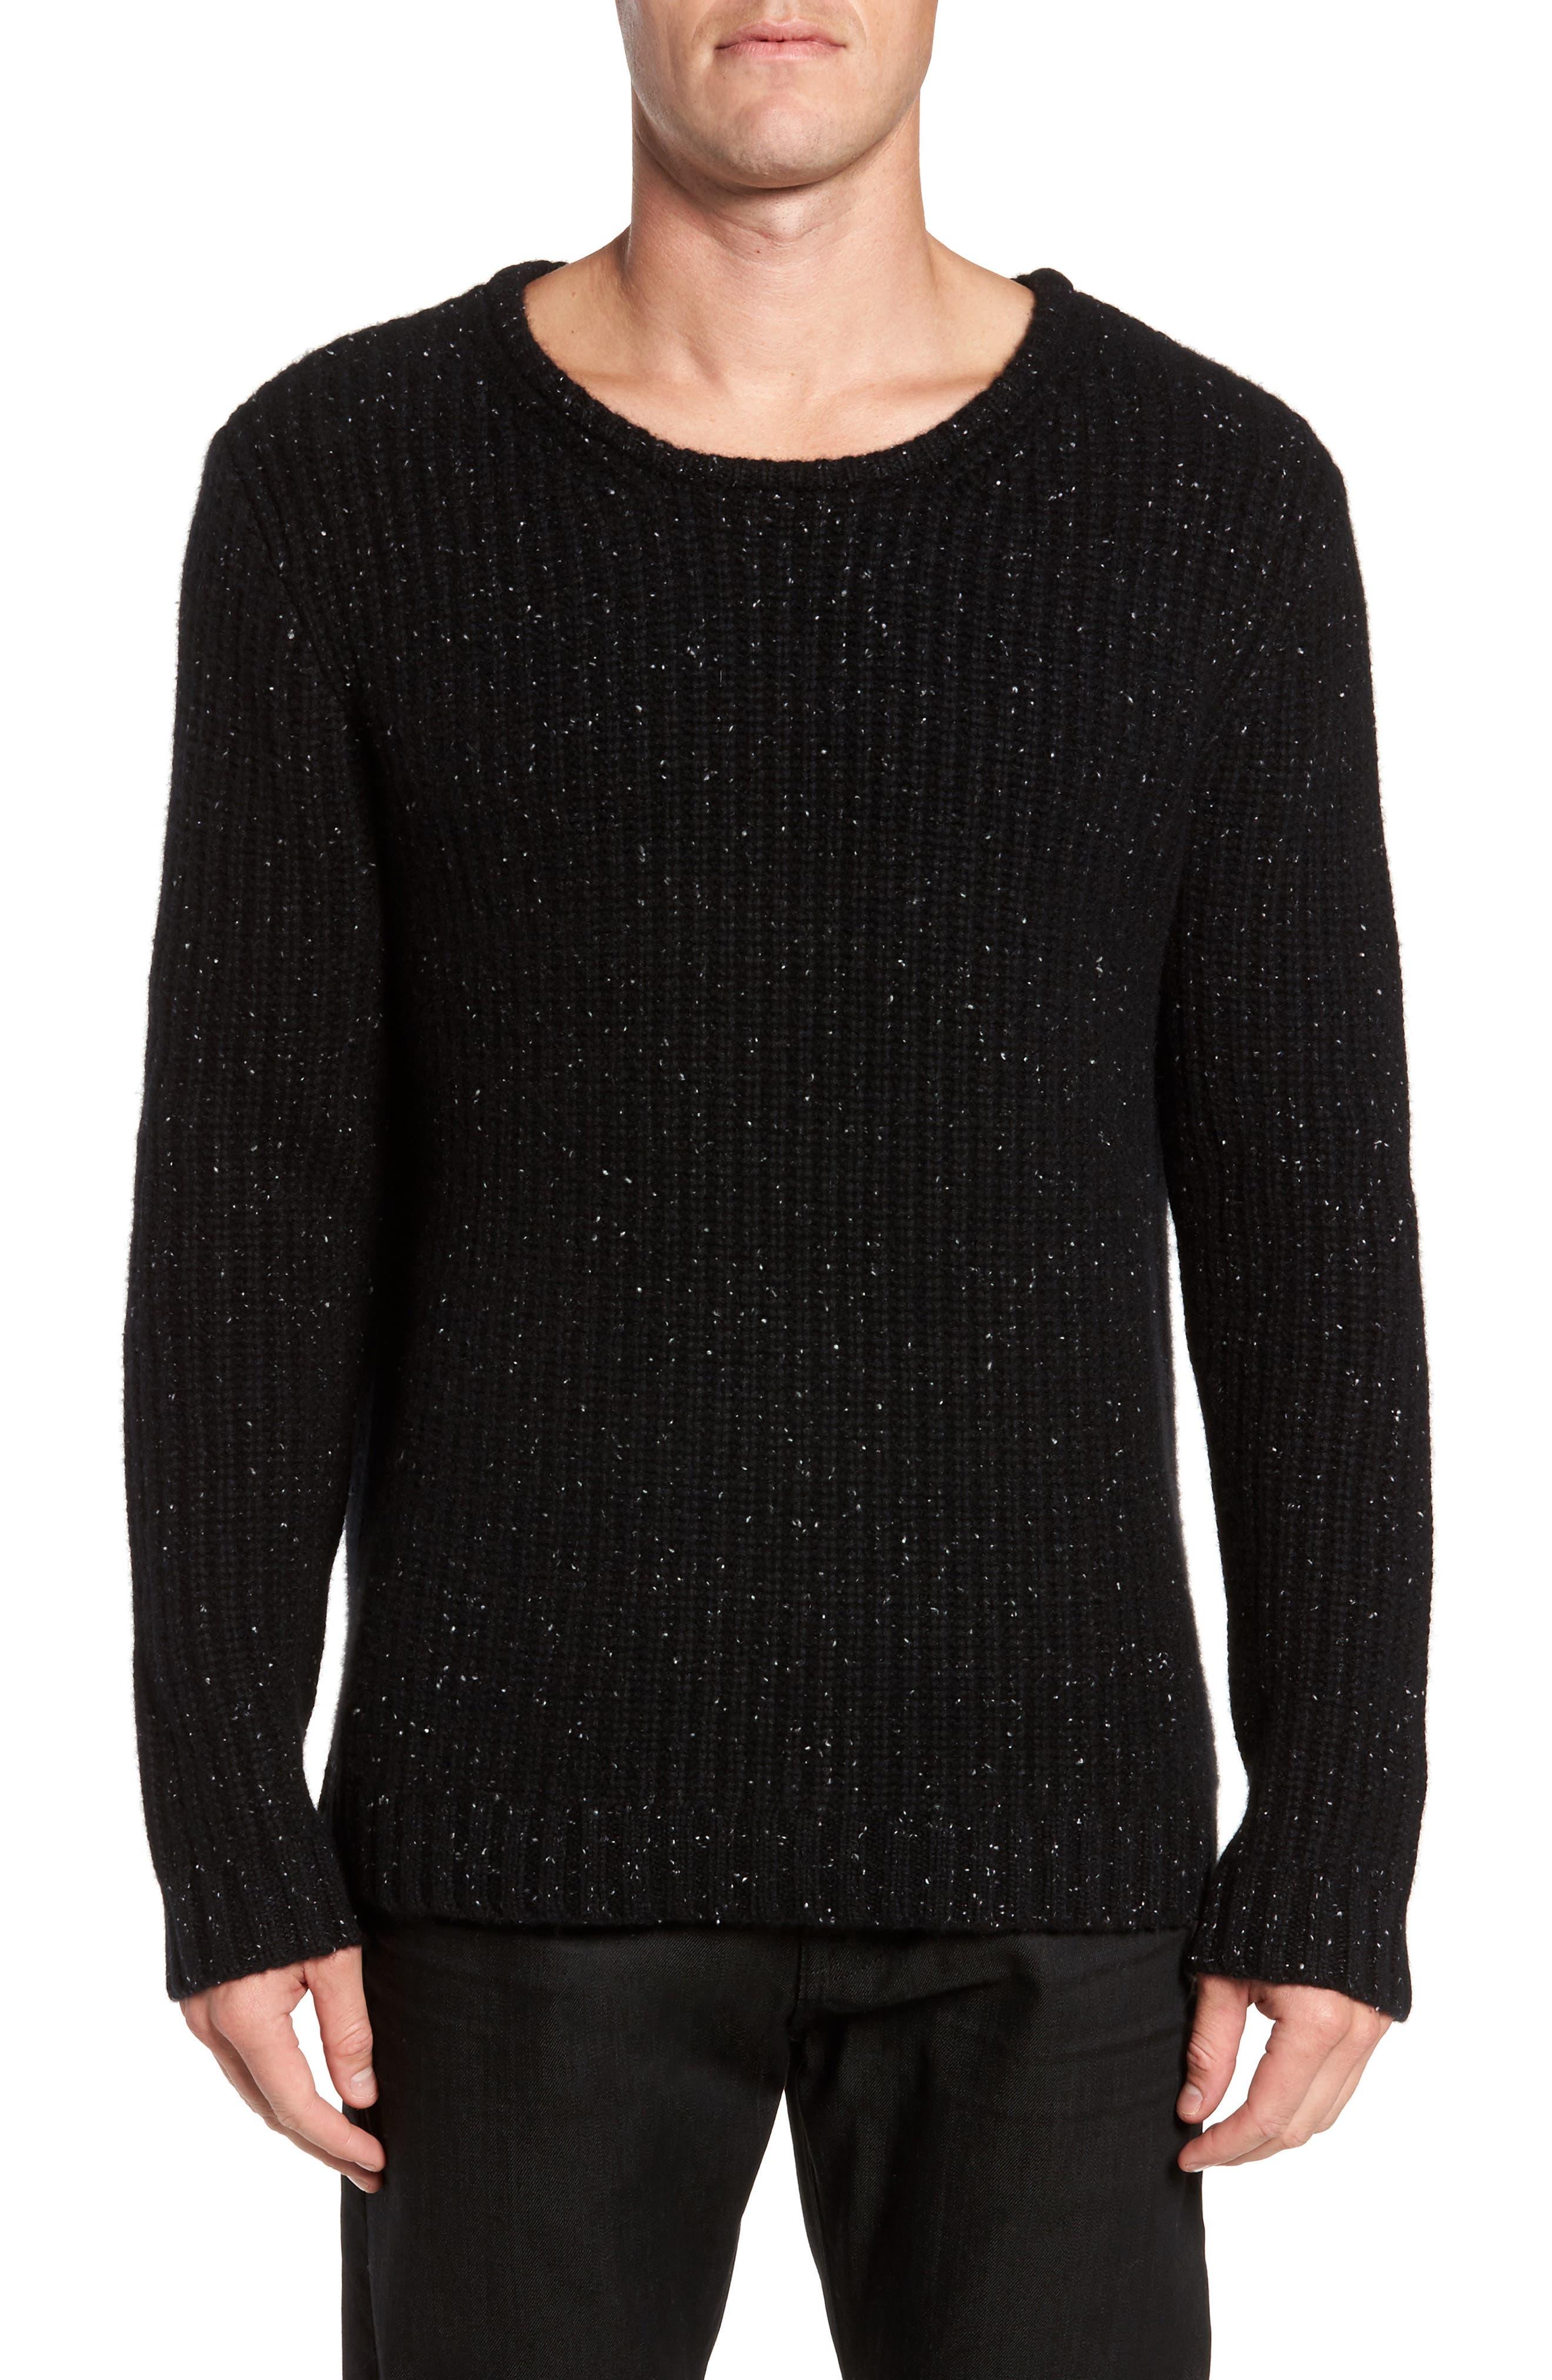 Oversize Cashmere Sweater,                             Main thumbnail 1, color,                             001